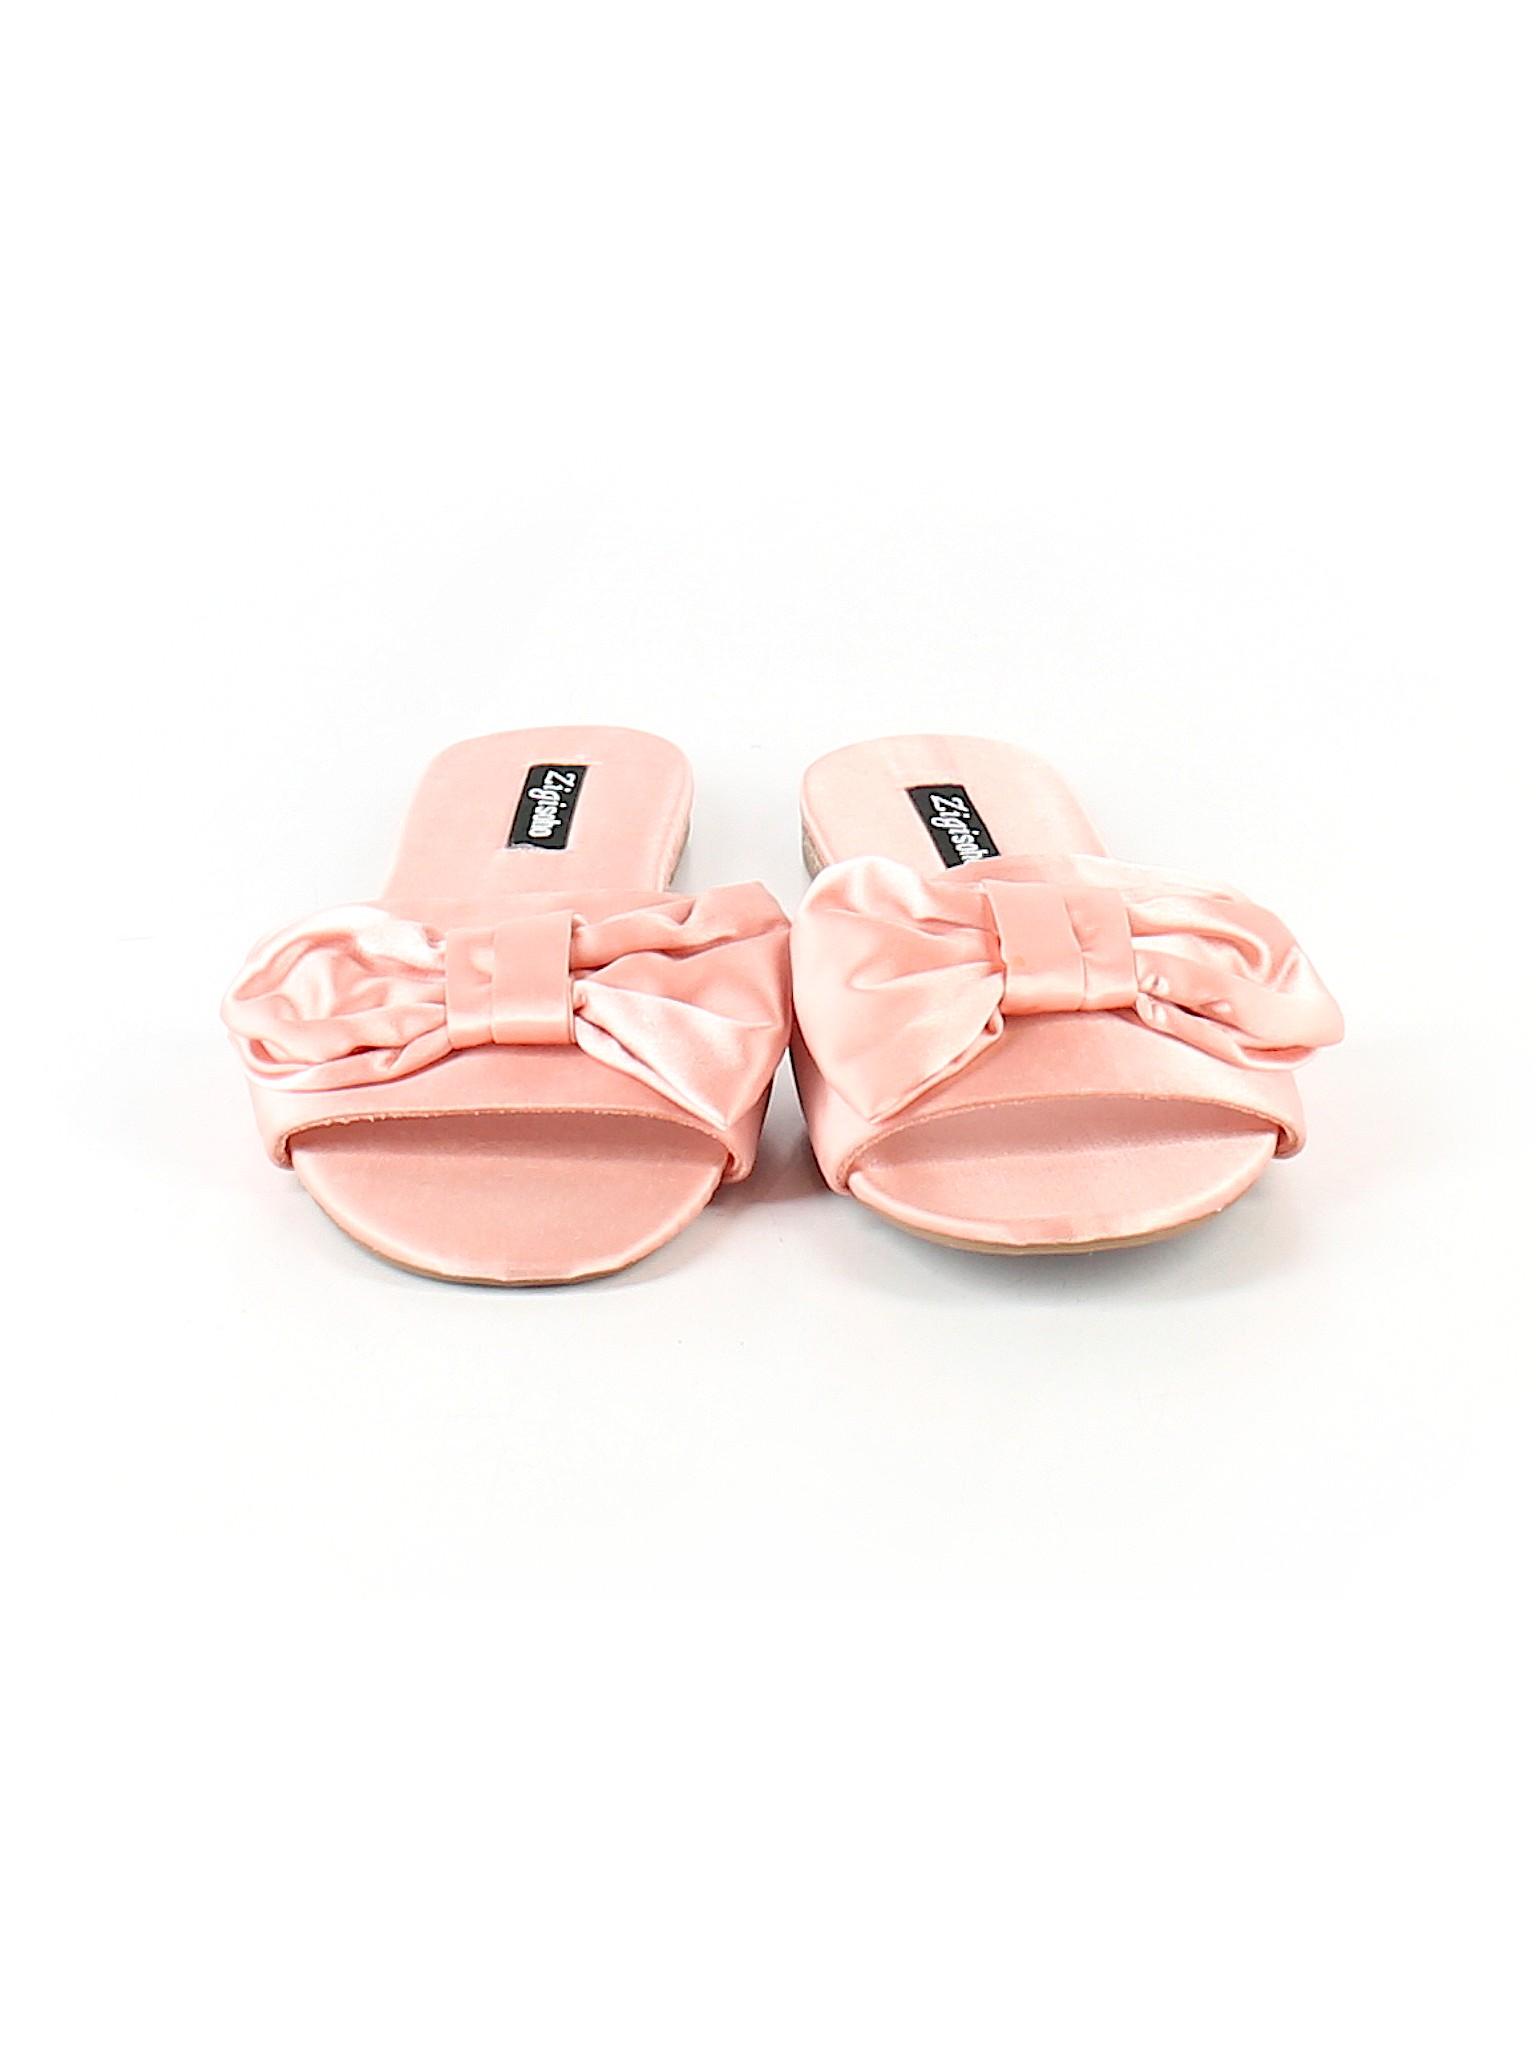 4efb2116c593 Zigi Soho Solid Light Pink Sandals Size 8 1 2 - 62% off